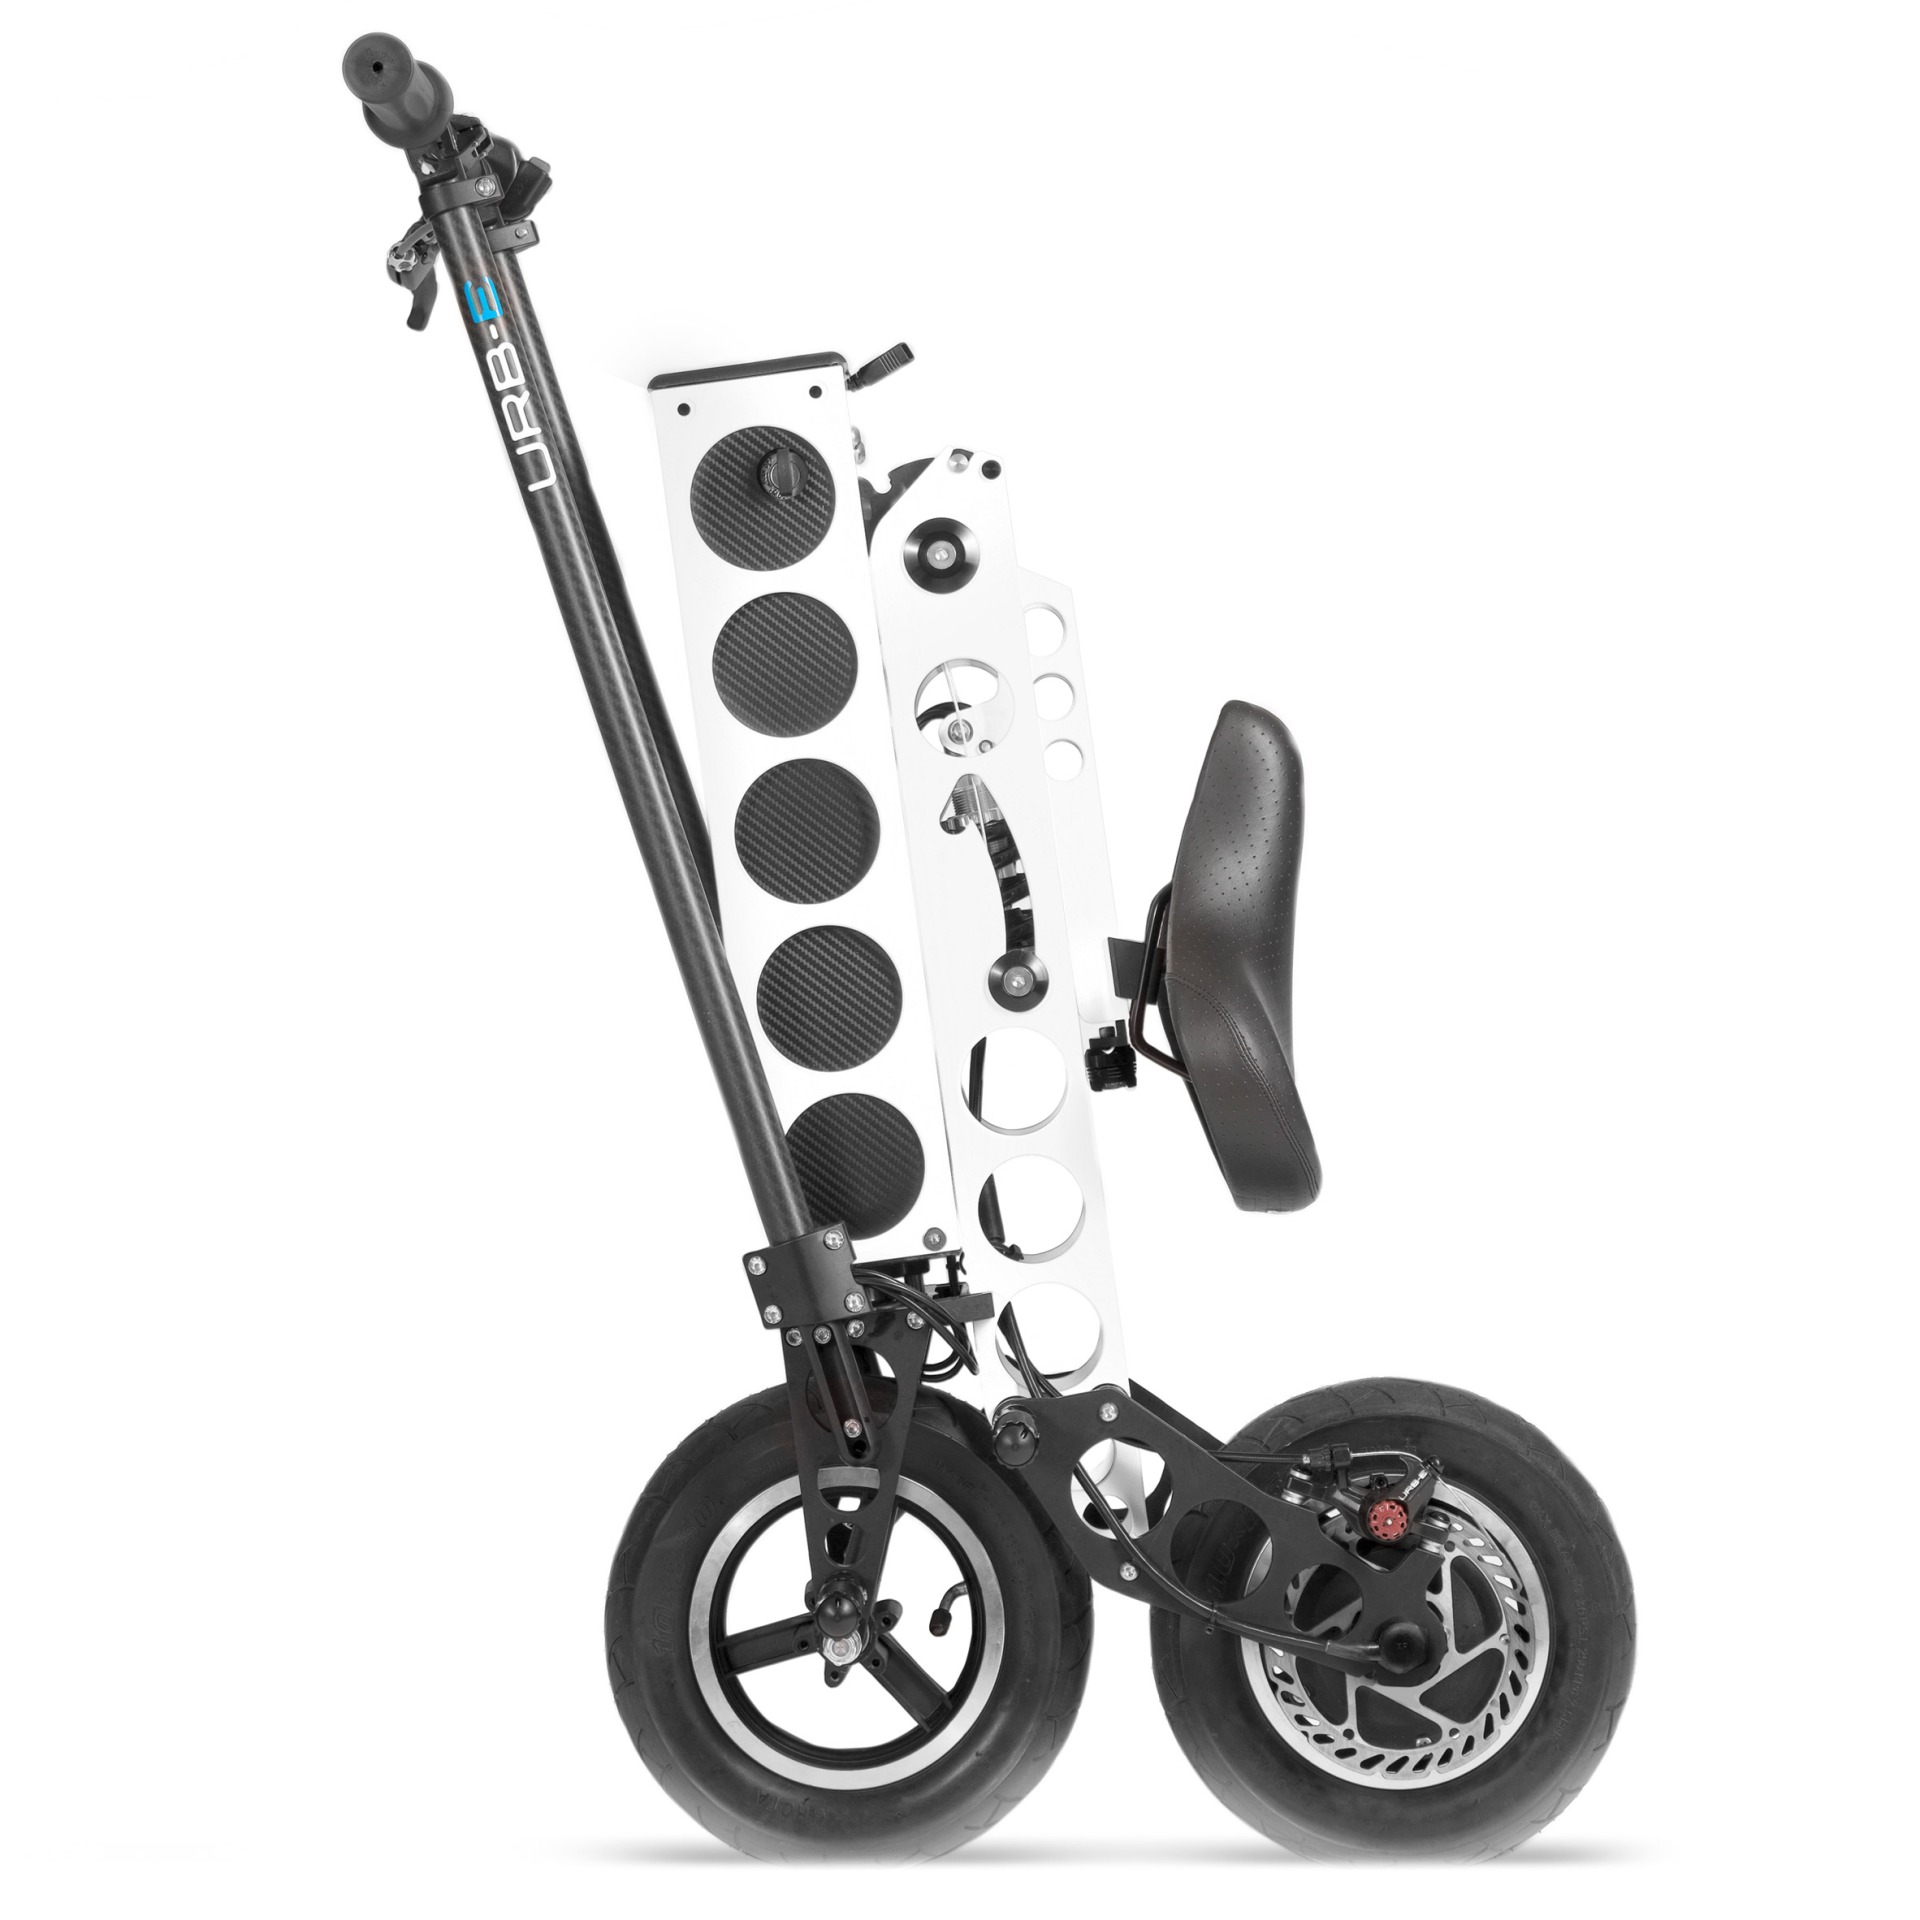 urb-pro-e-scooter-design-transport-electric-vehicles-ces_dezeen_2364_col_8